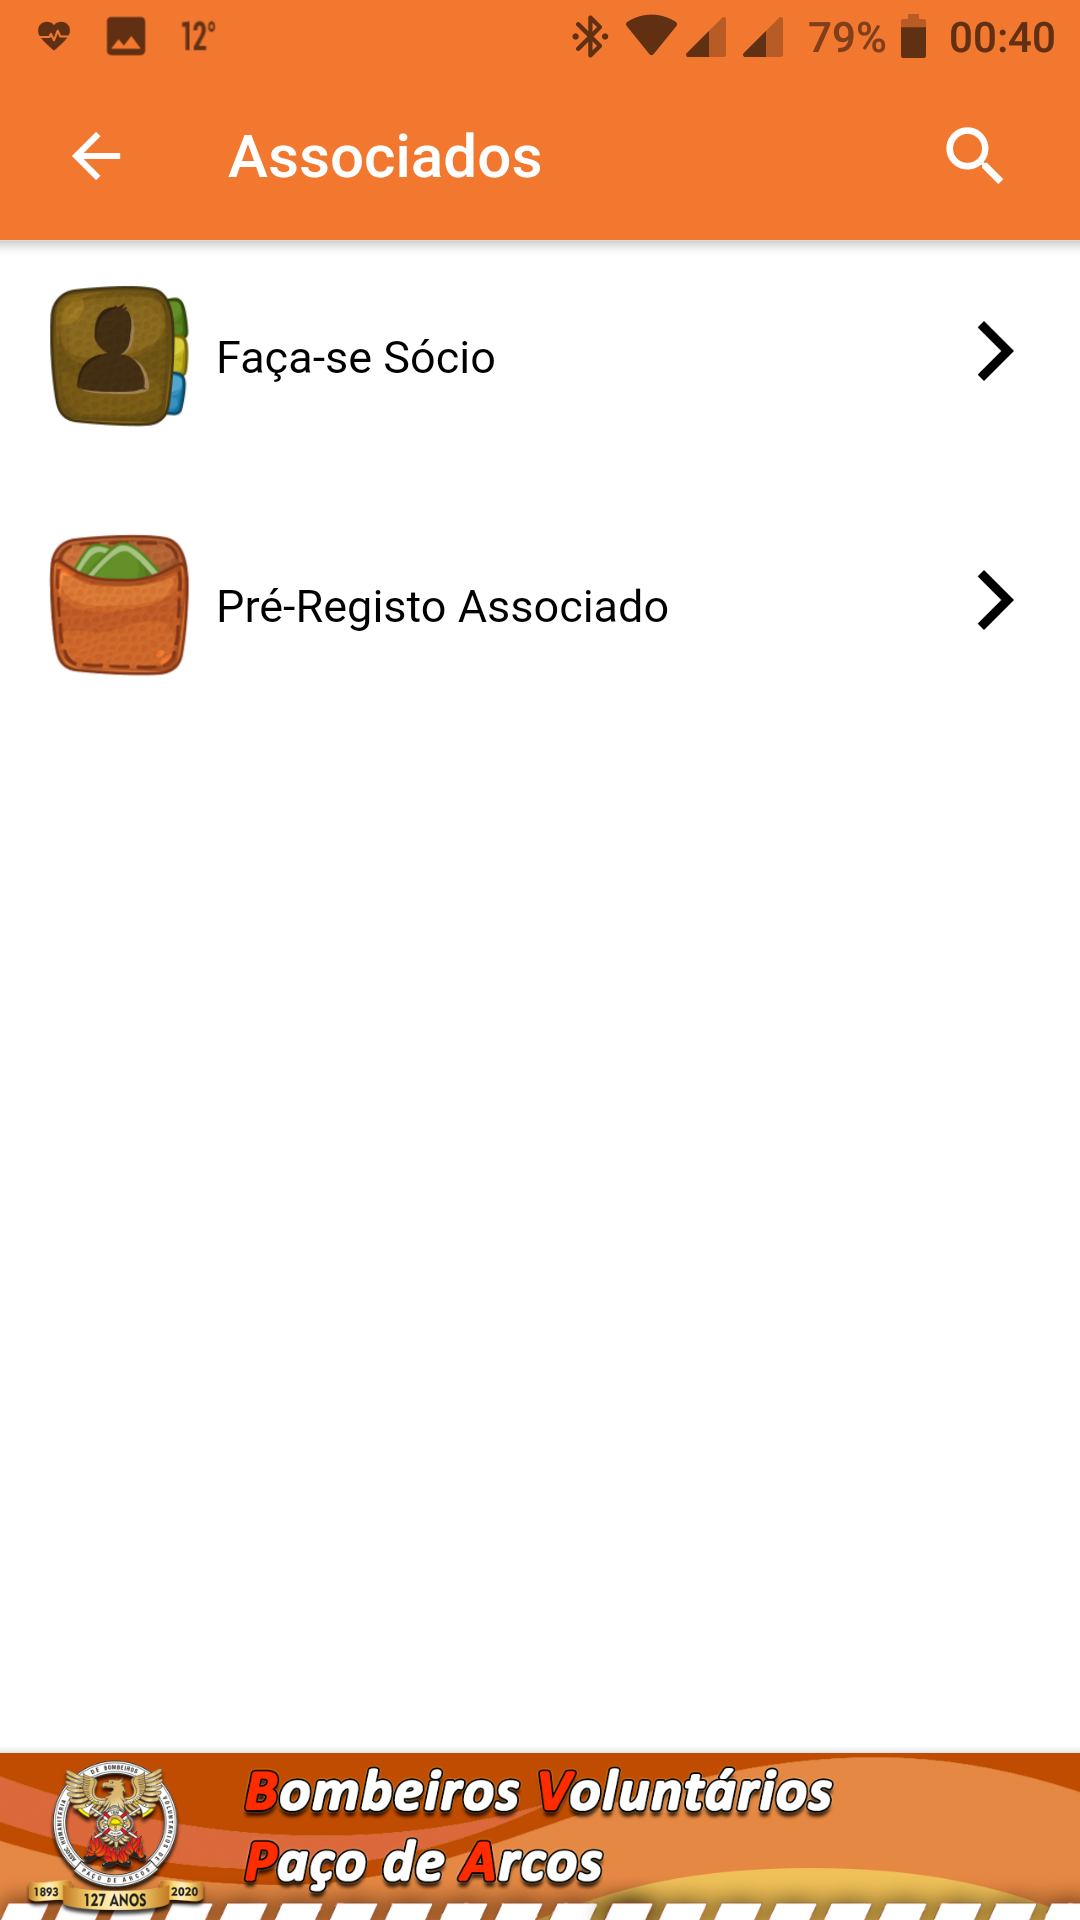 app_bvpacodearcos_20201030 (25)